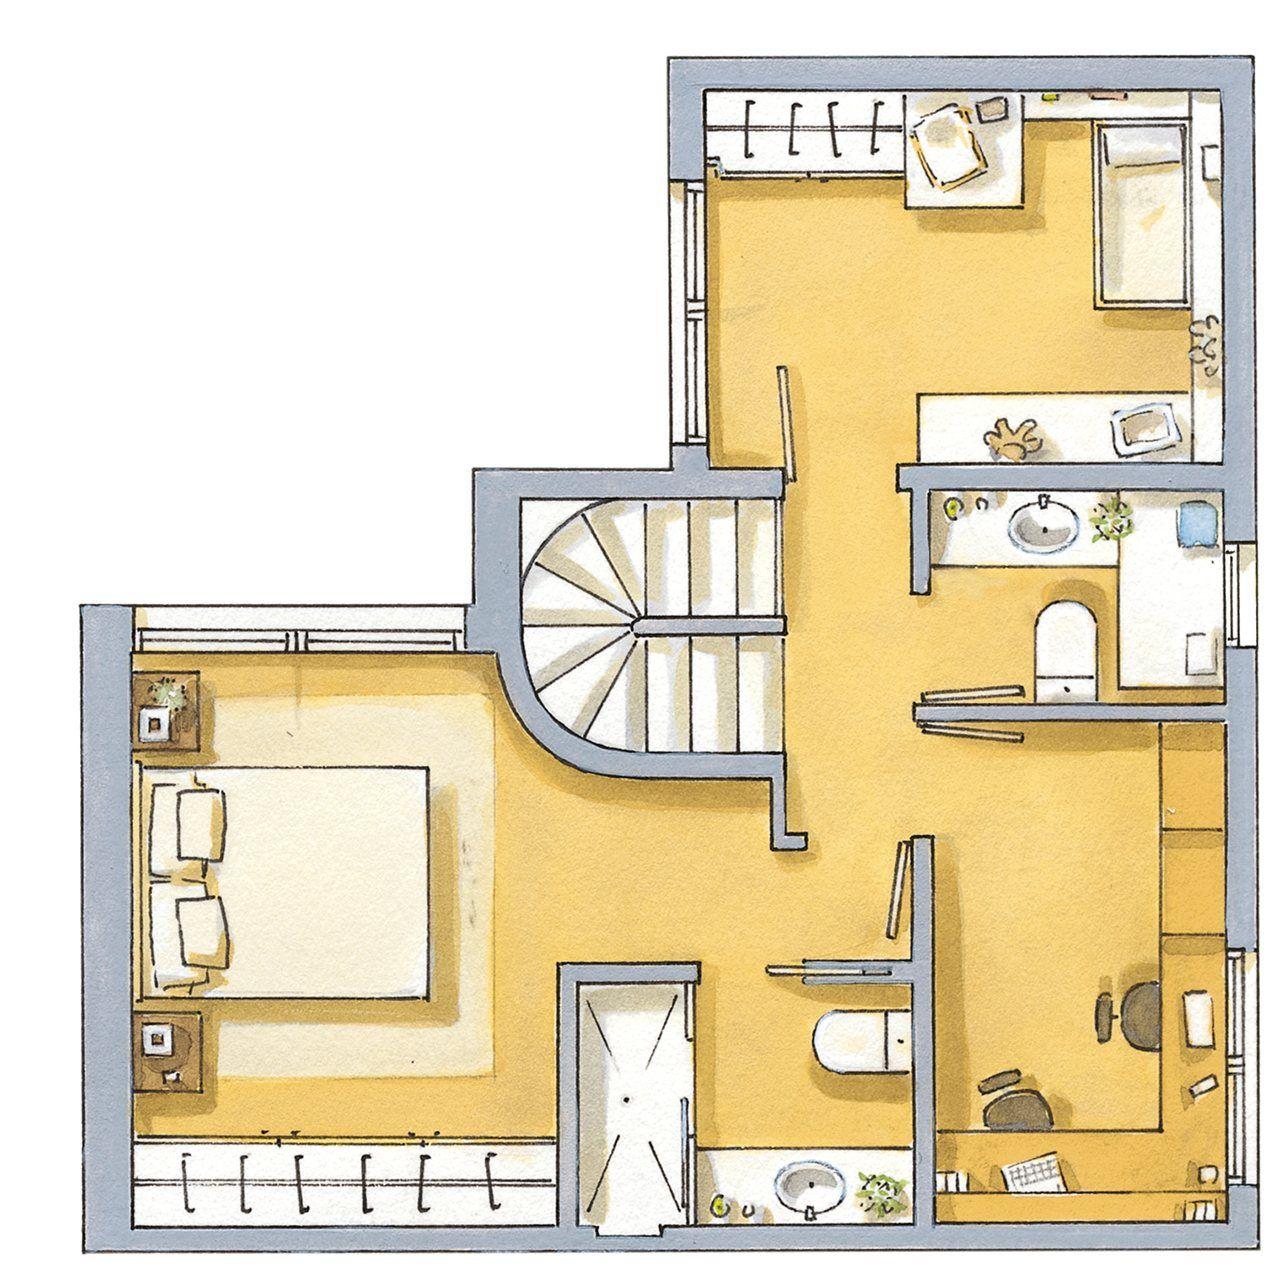 Primer piso dise os plantas de casas projeto for Diseno apartamentos duplex pequenos